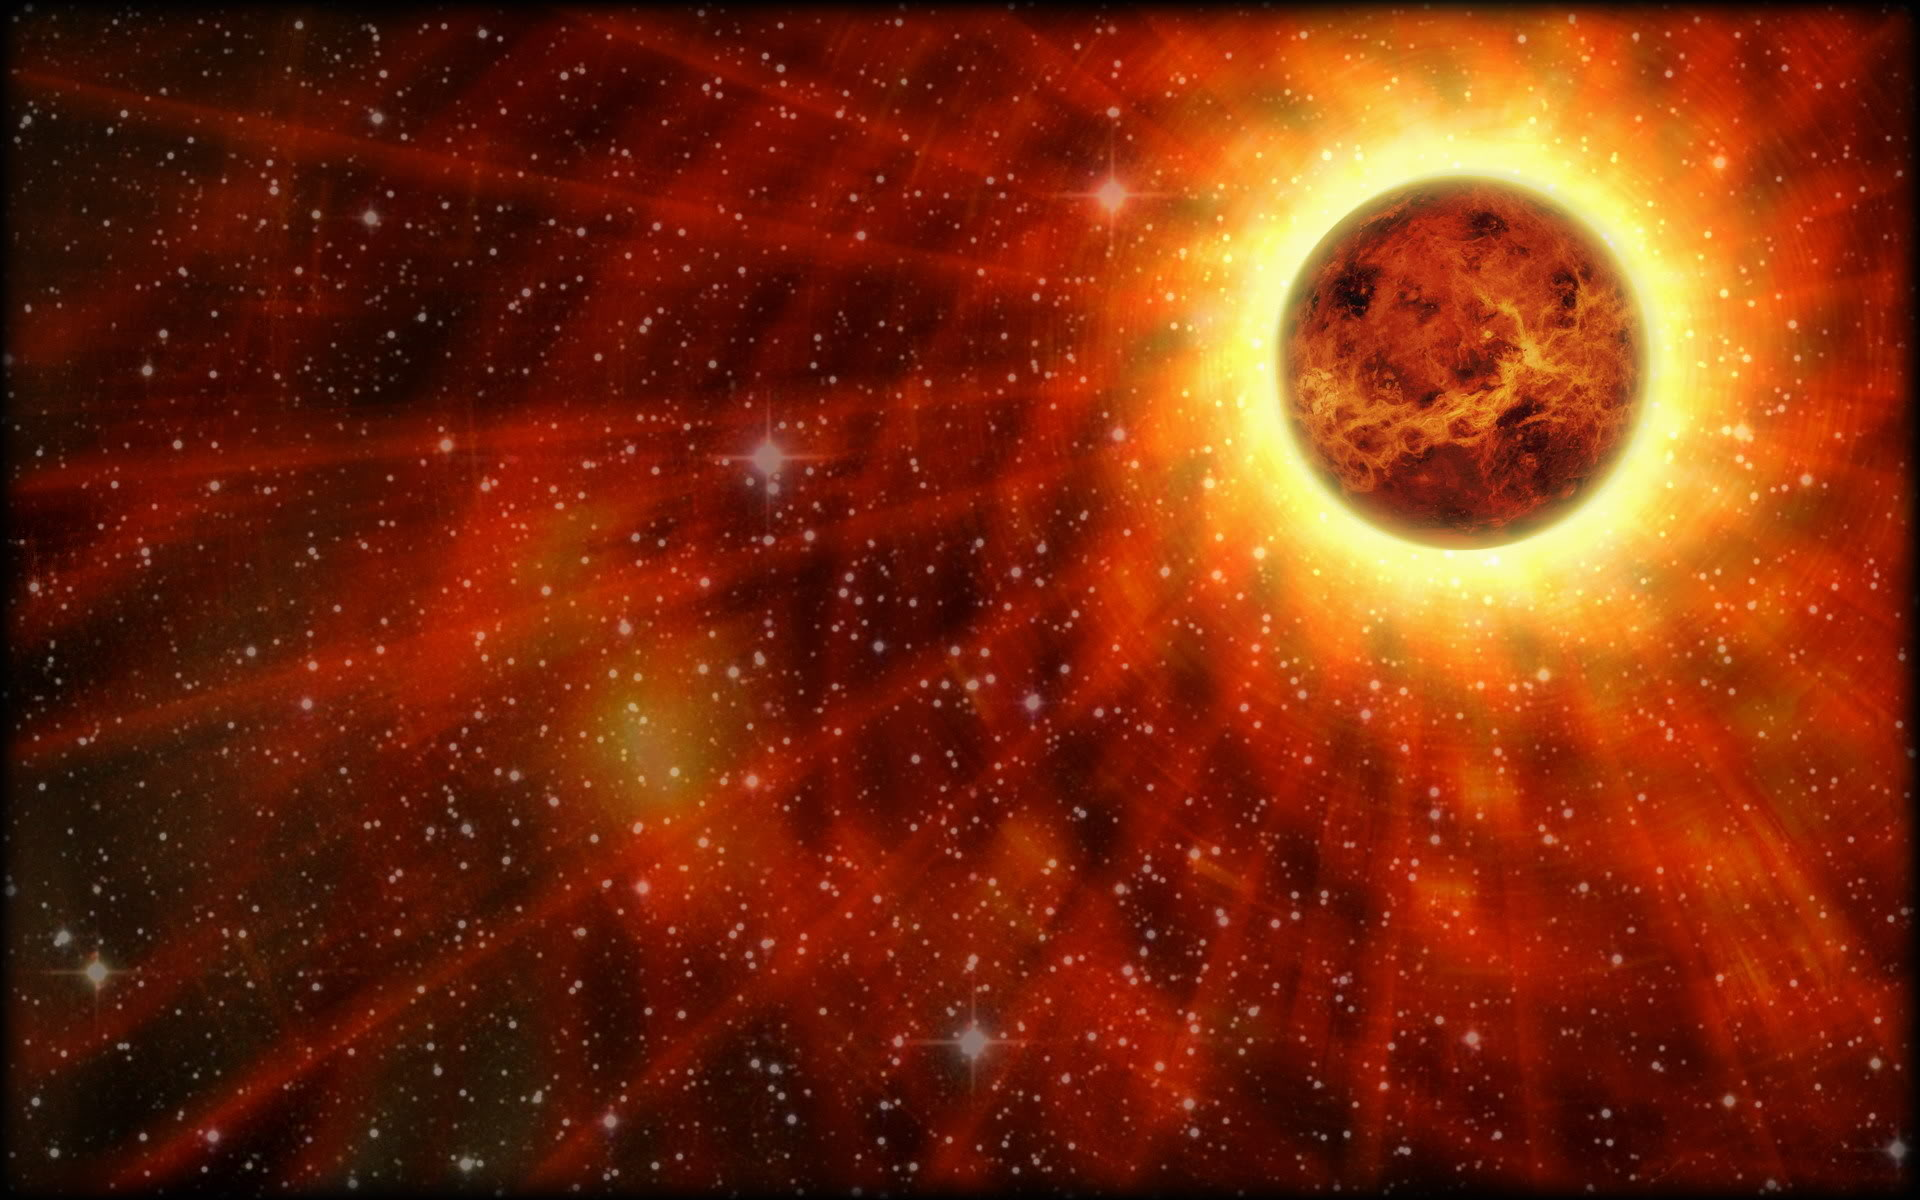 Download The Planet Venus Wallpaper 1920 X 1200 32720 HD Wallpaper 1920x1200